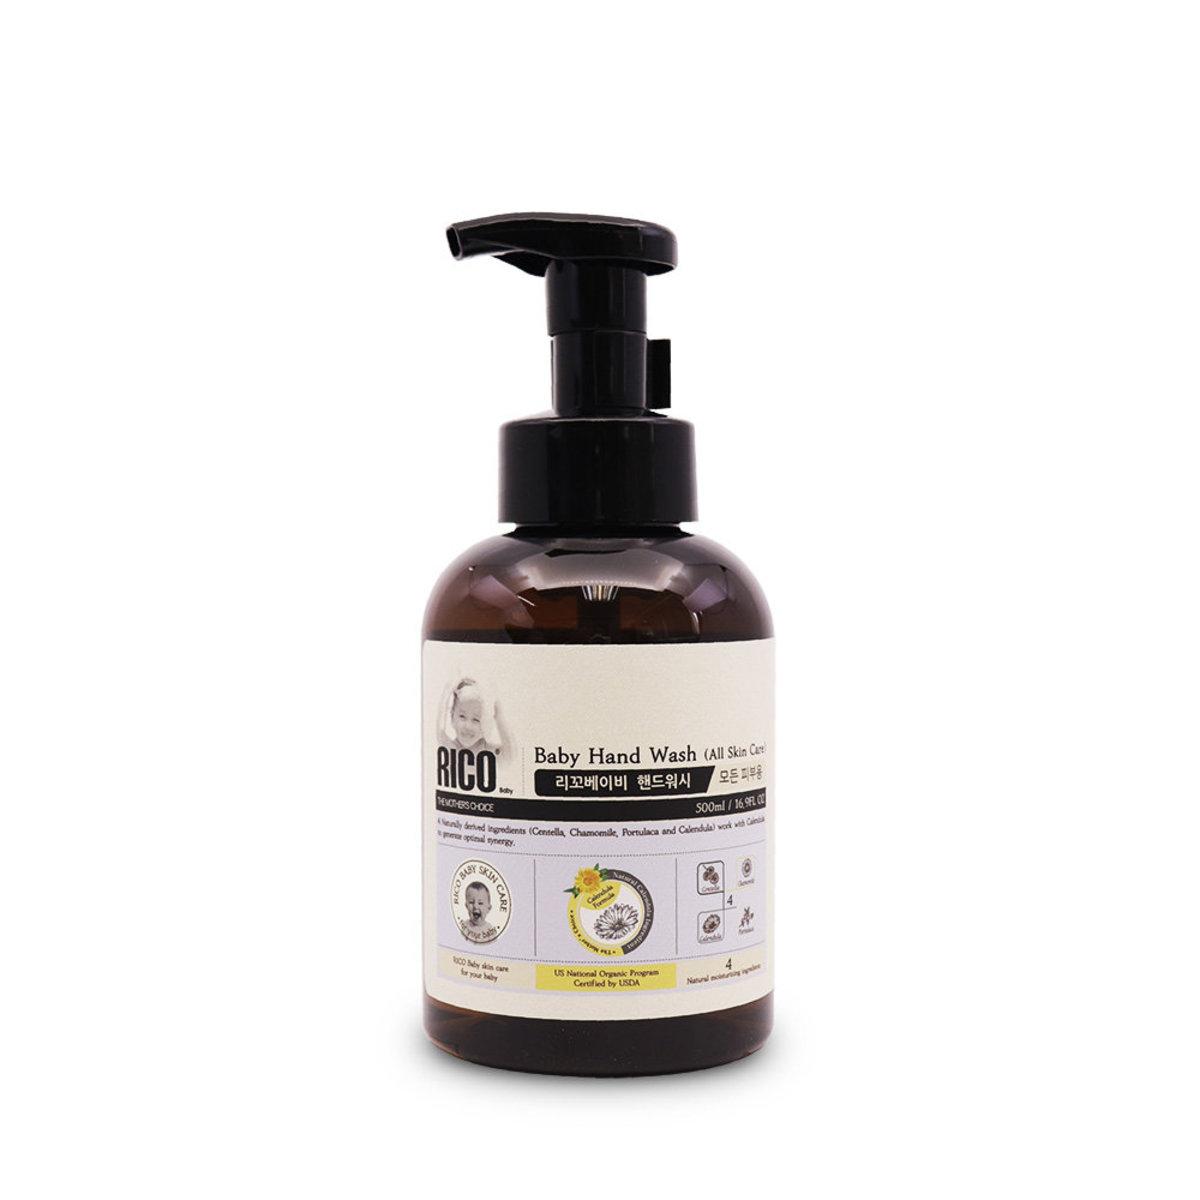 Baby Hand Wash (All Skin Care) 500ml